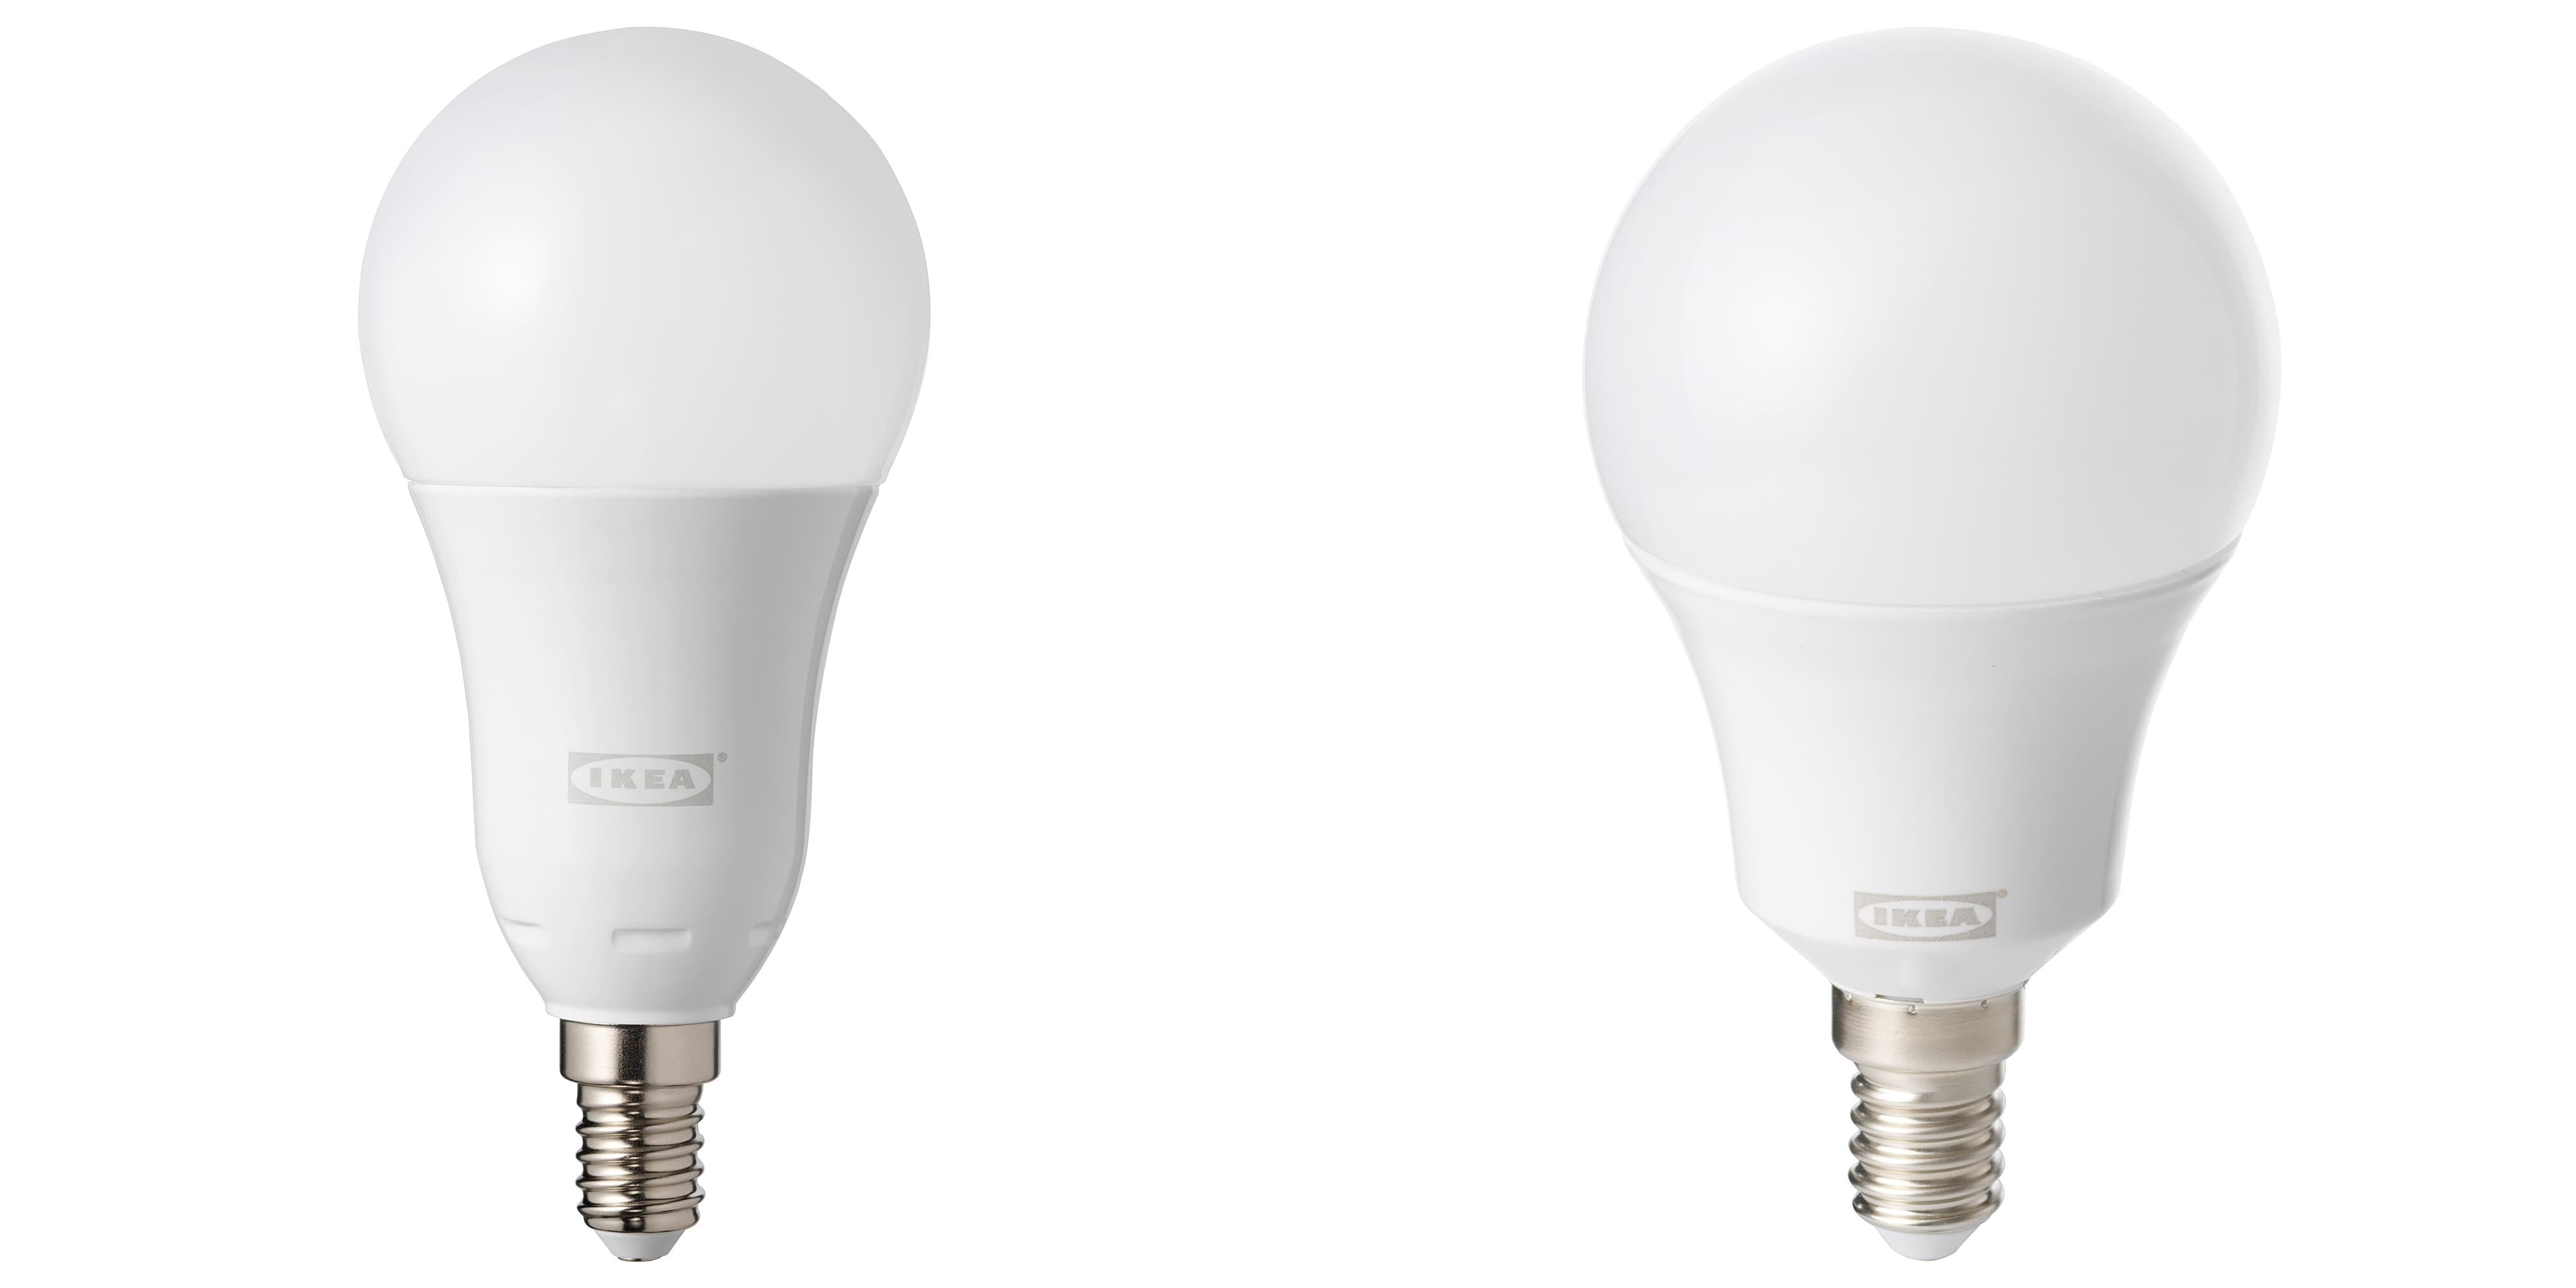 IKEA slimme lamp kleine fitting